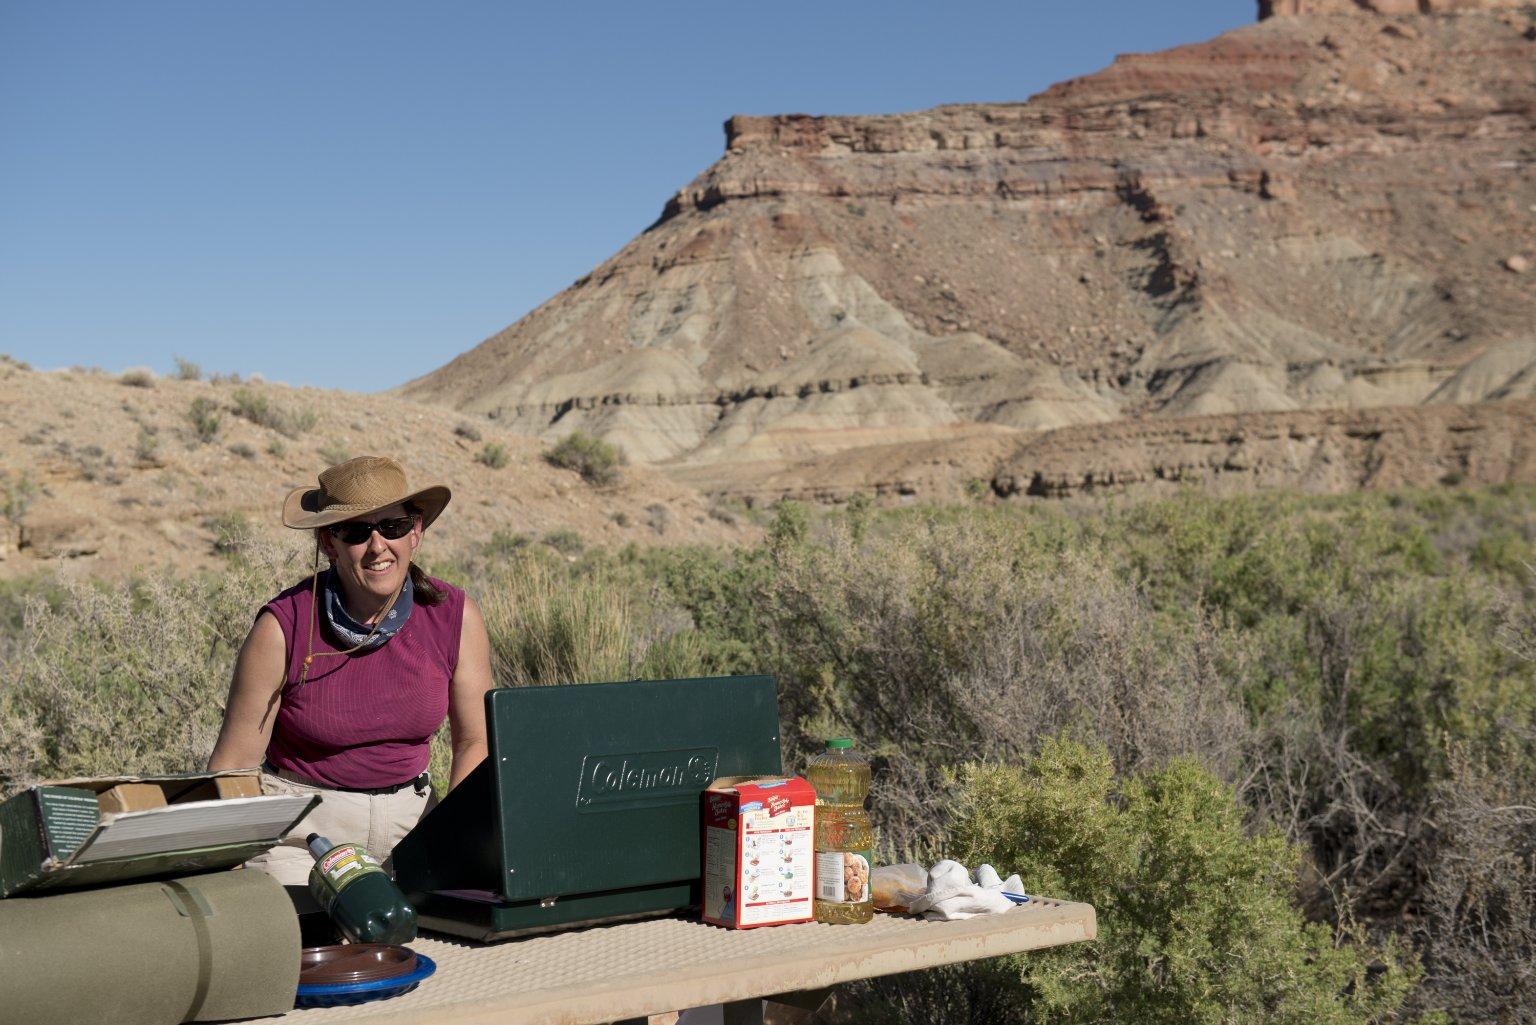 Collecting Solifugae with Dr. Paula Cushing